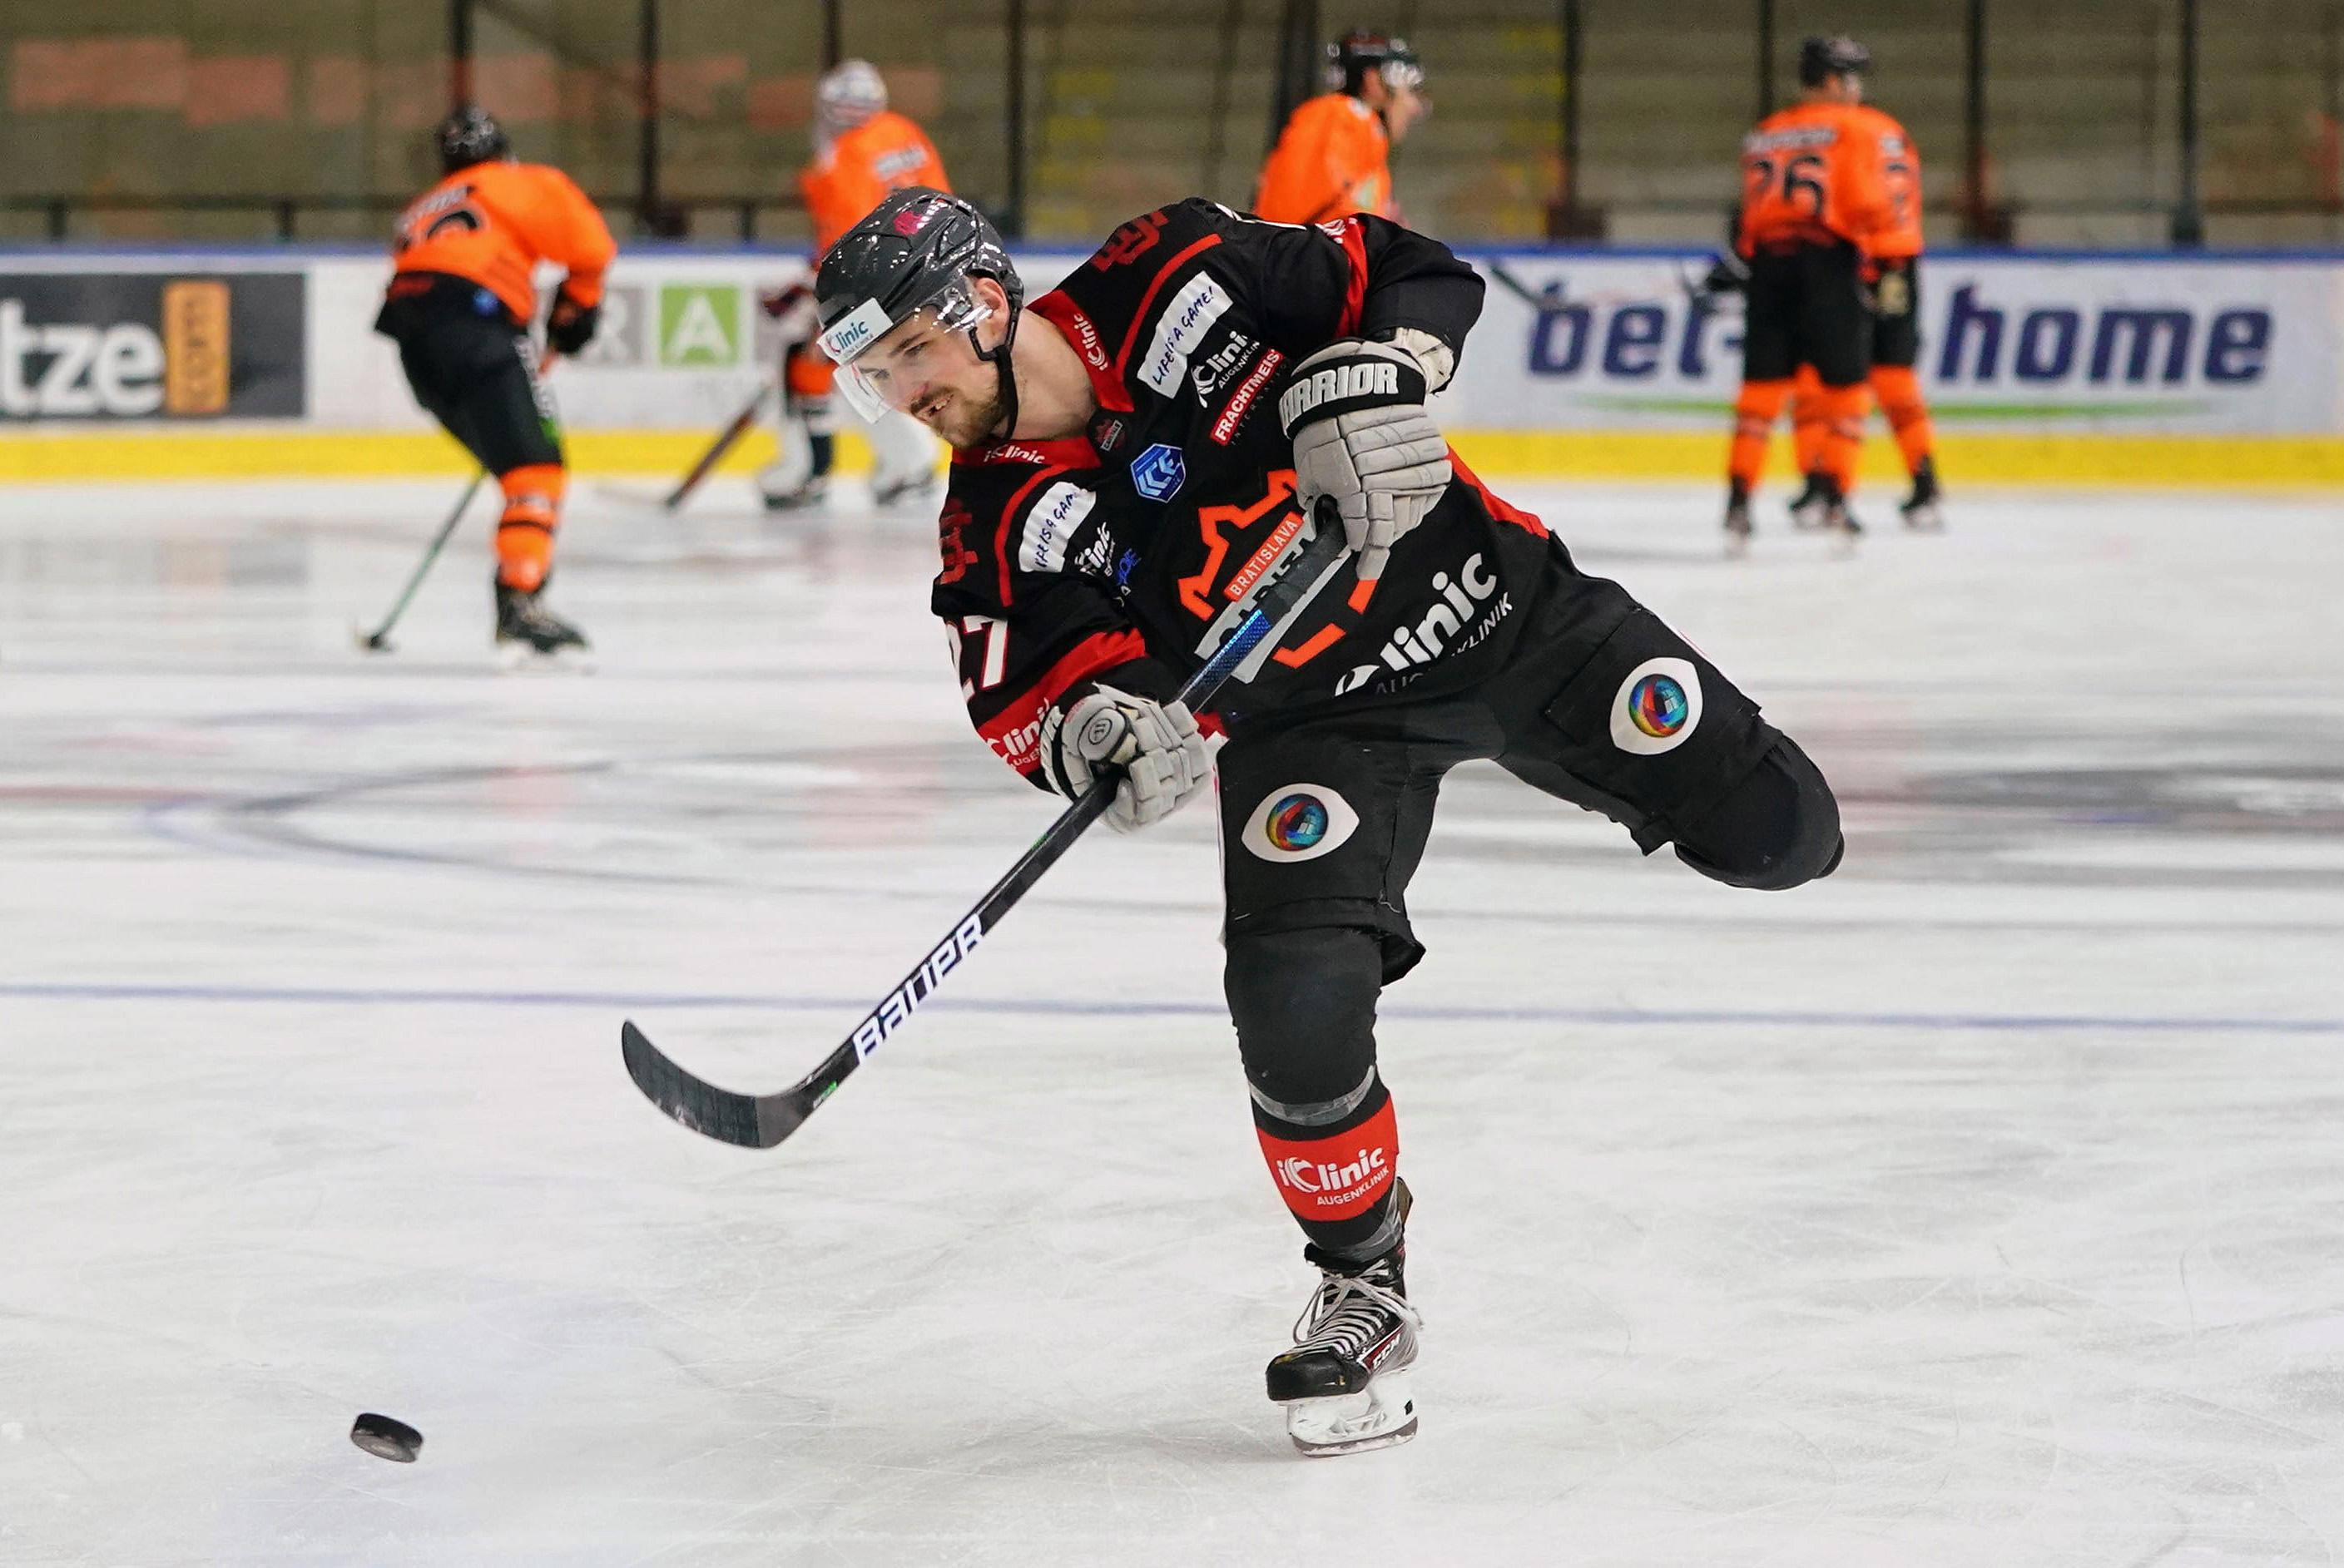 Moser Medical Graz99ers v iClinic Bratislava Capitals - Bet-at-home Ice Hockey League